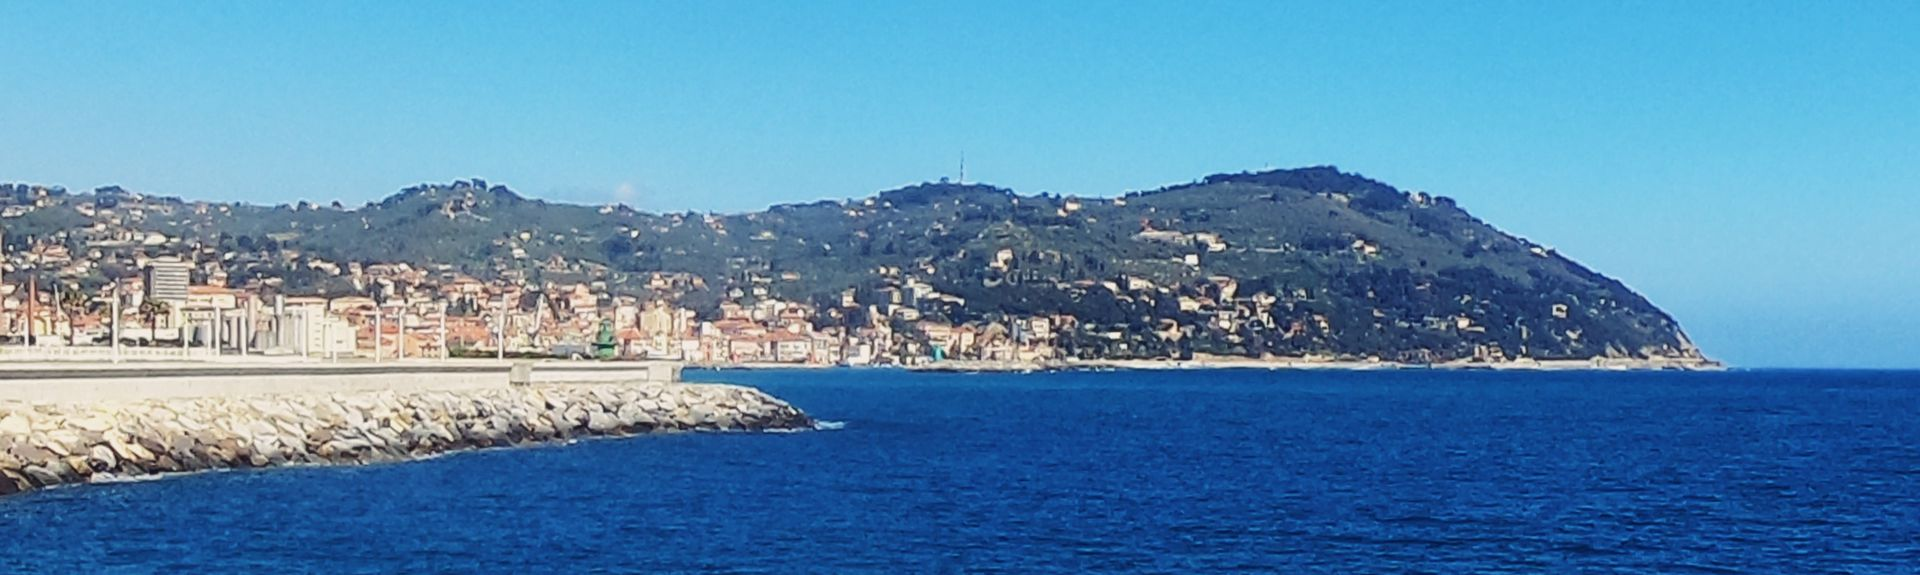 Garlenda, Savona, Liguria, Italy